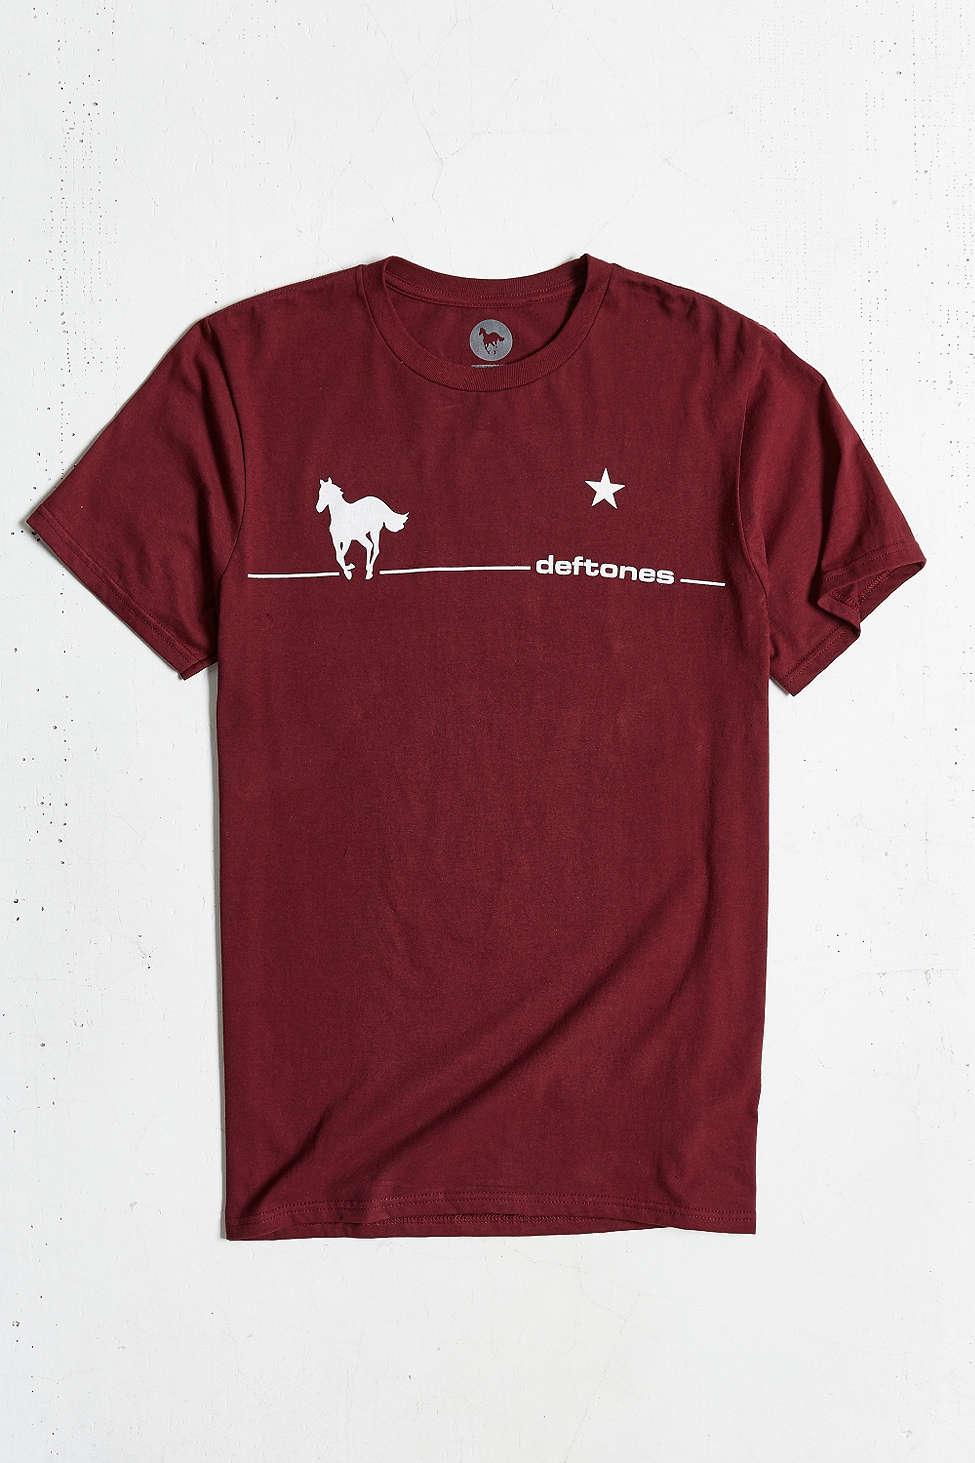 T shirt deftones white pony - Gallery